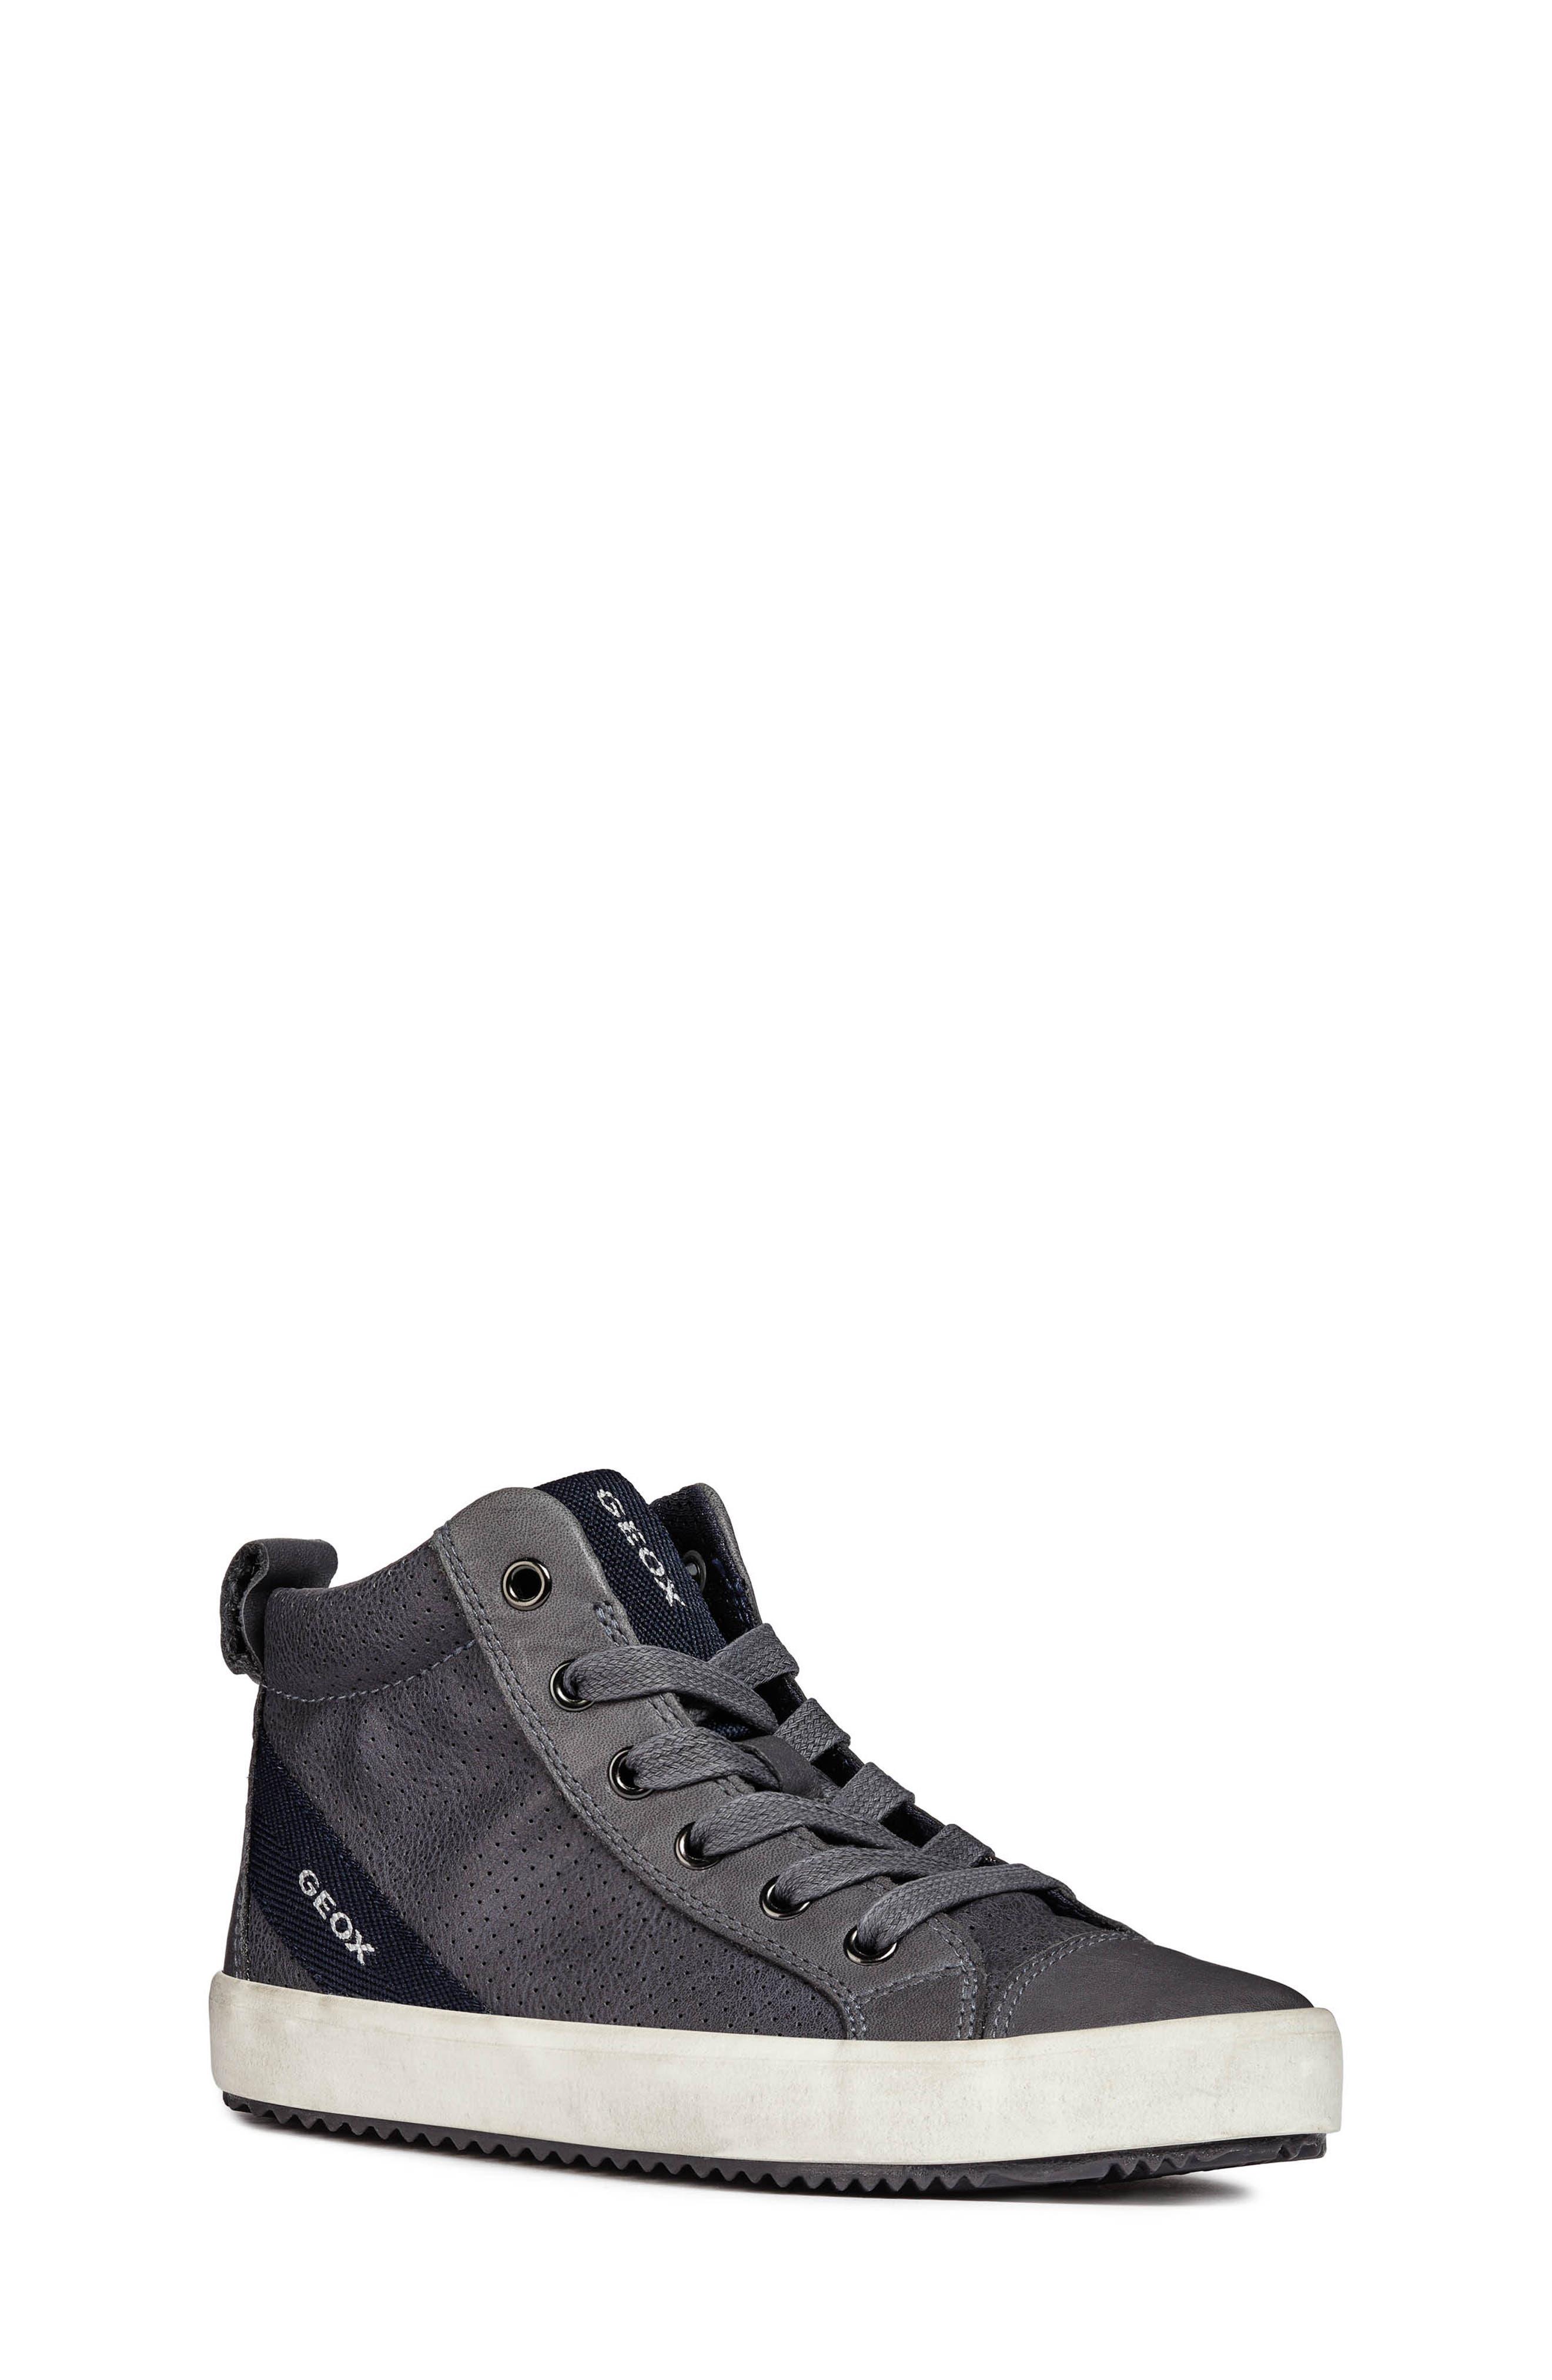 Alonisso High-Top Sneaker,                             Main thumbnail 1, color,                             GREY/DARK GREY